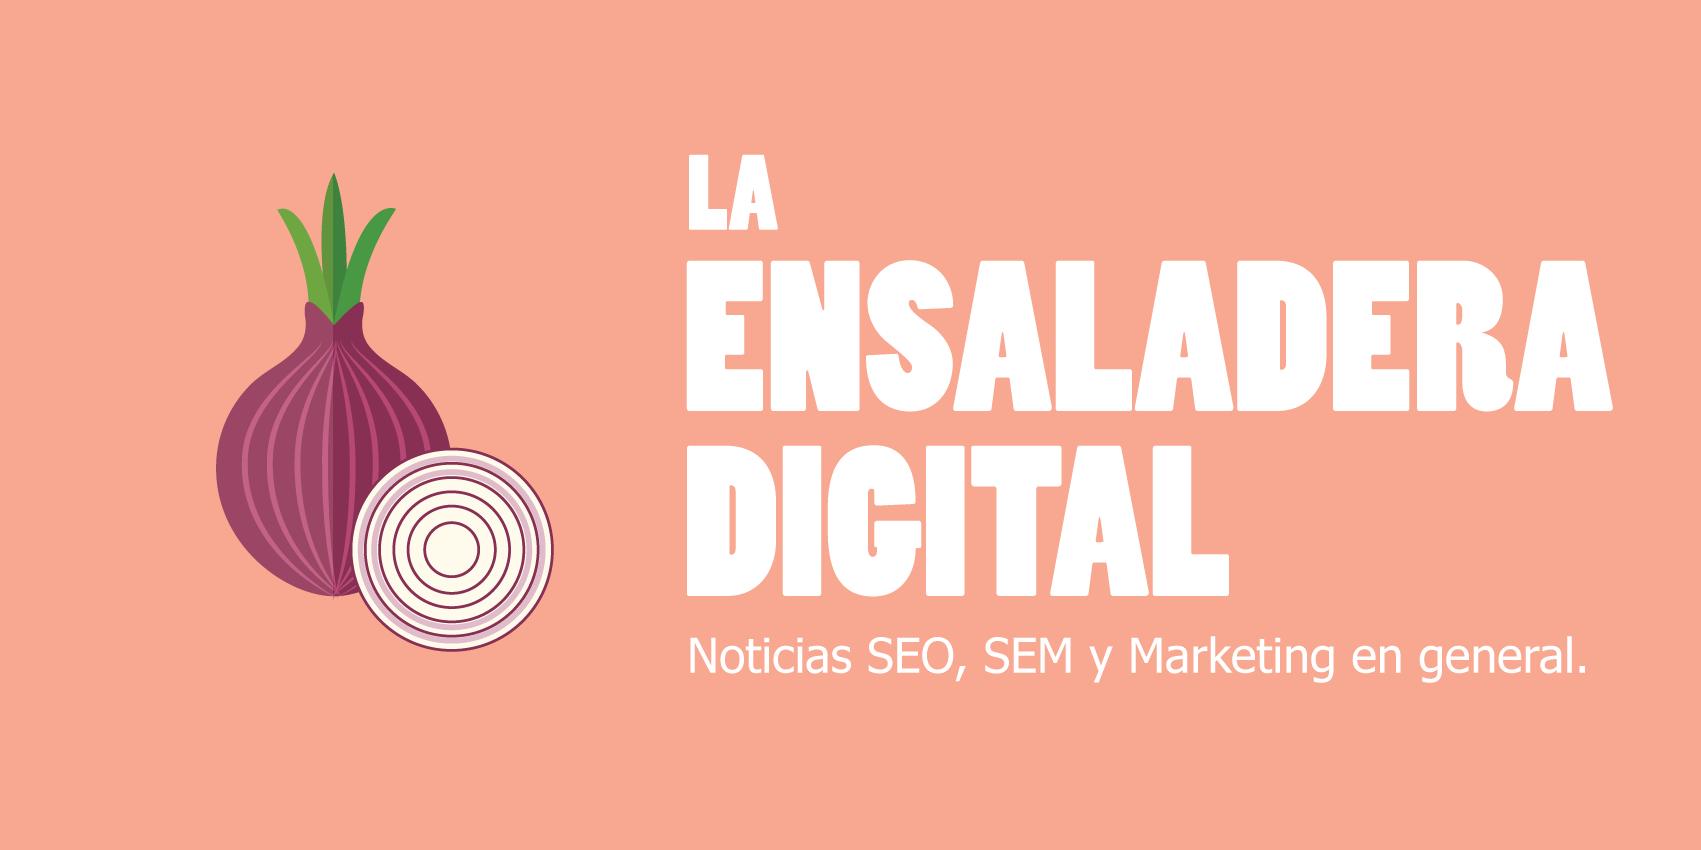 la-ensaladera-digital-03